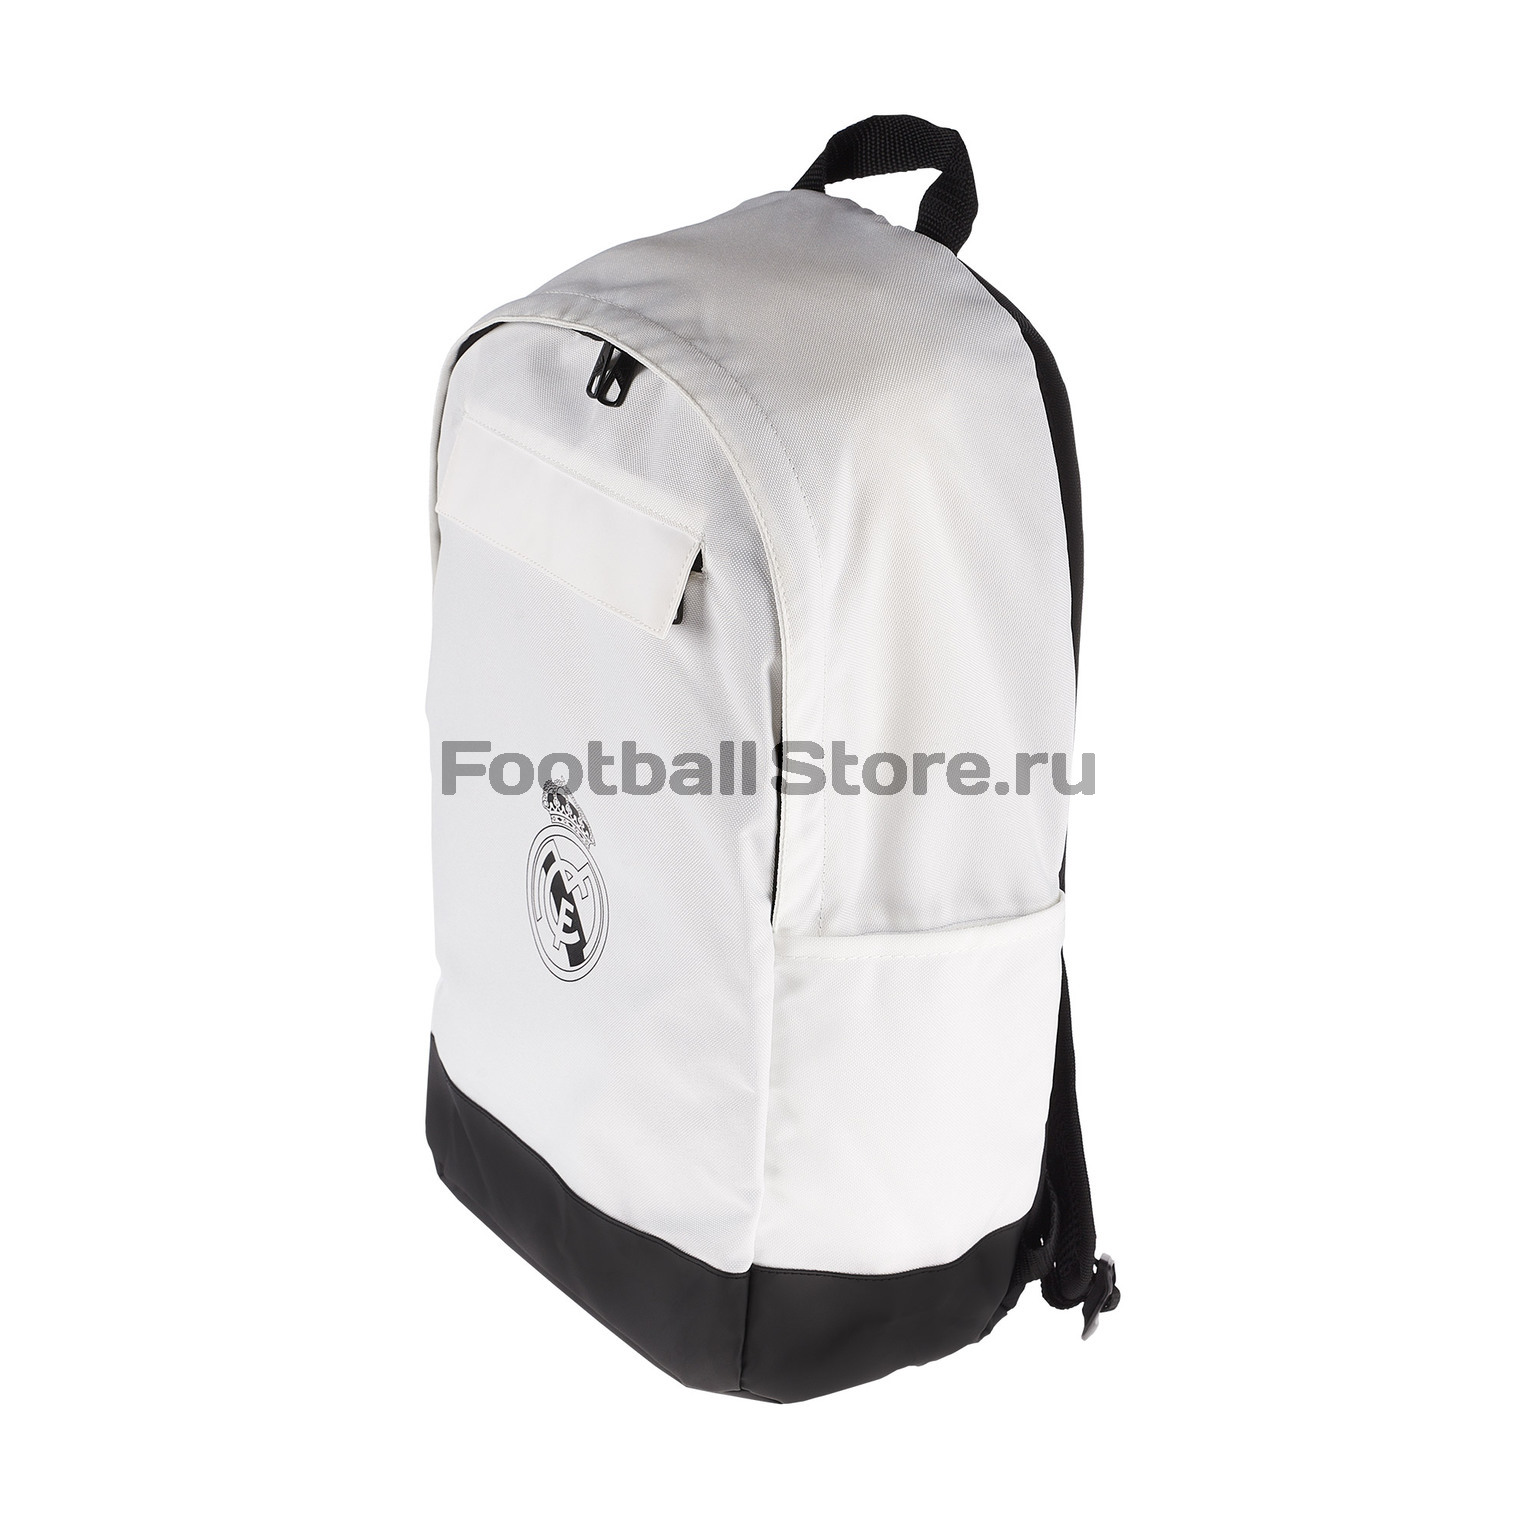 Рюкзак Adidas Real Madrid CY5597 рюкзак adidas real madrid cy5597